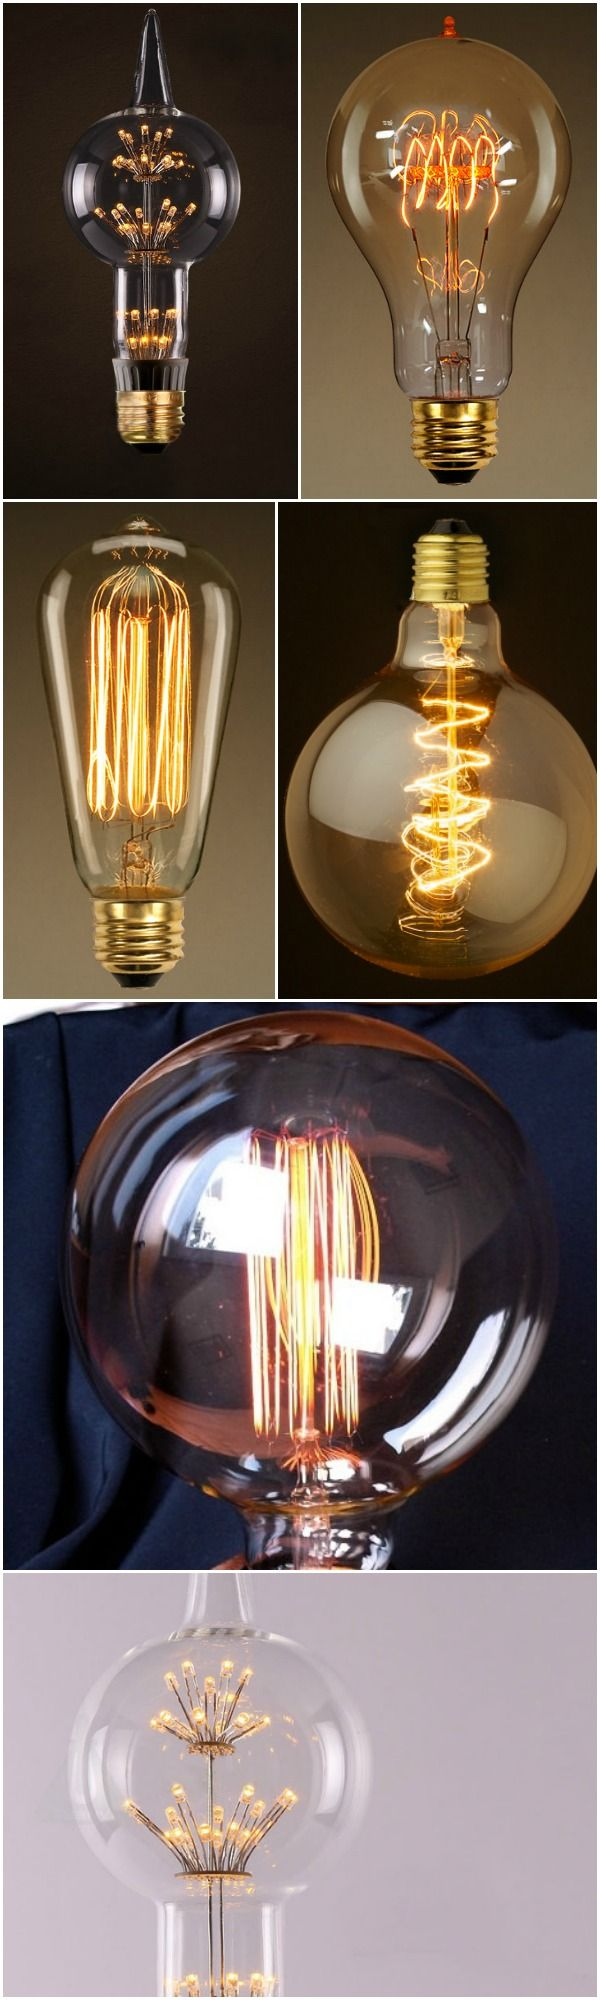 10 Edison Light Bulbs Comparative - #TableLamps #Antique #Design #Edison #Glass #Huge #Industrial #LED #LightBulb #Metal #Retro #Steampunk #Steel #Vintage (source: idlights.com)